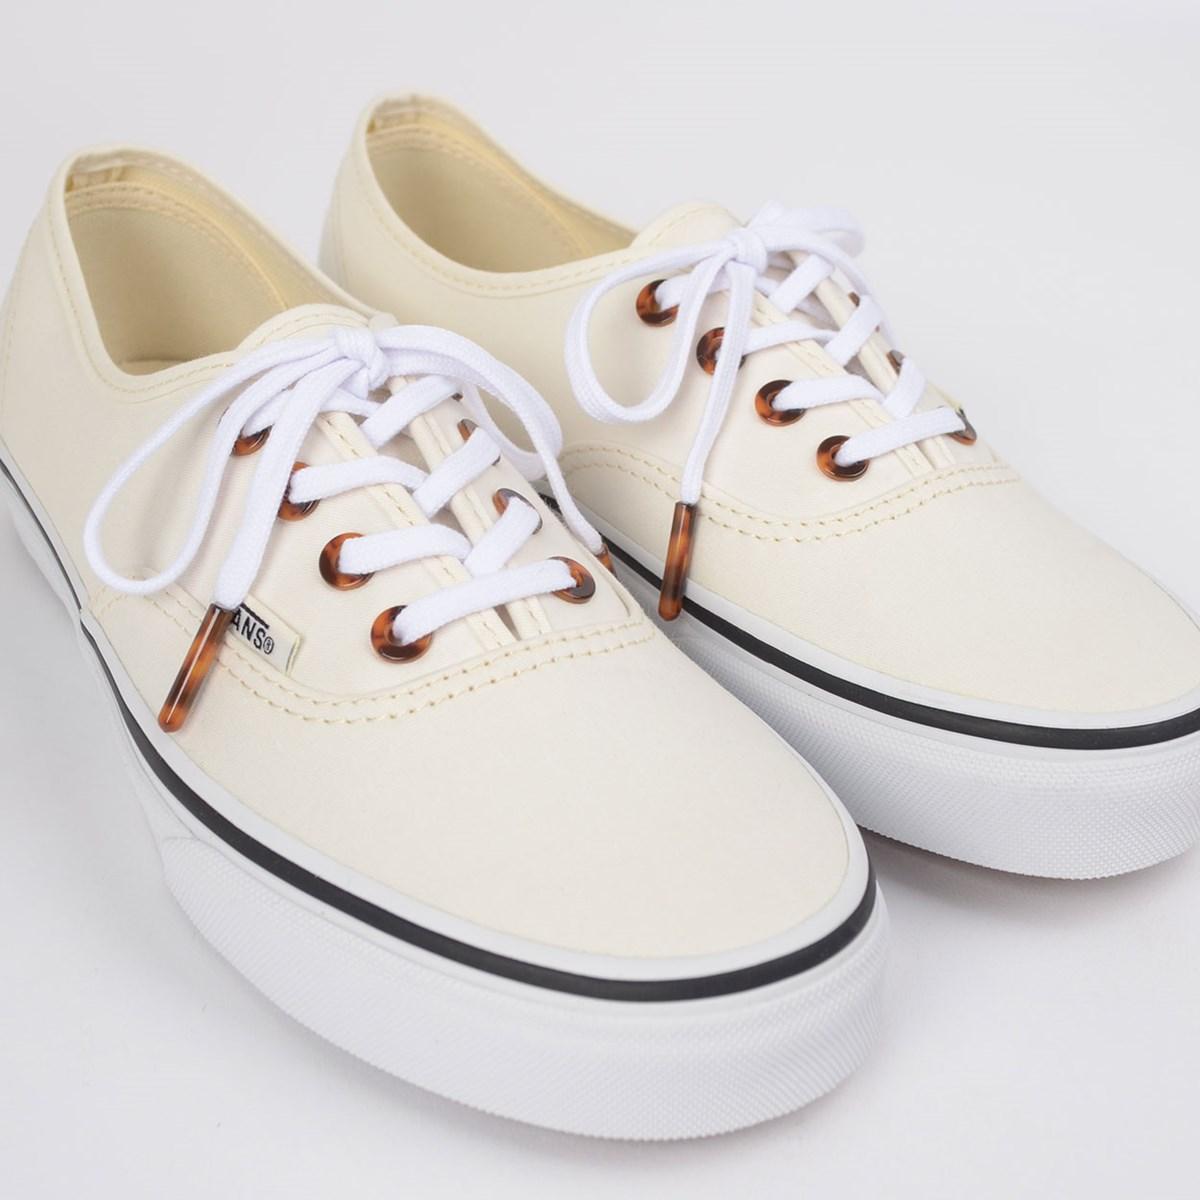 Tênis Vans Authentic Tort Classic White True White VN0A2Z5IWO1